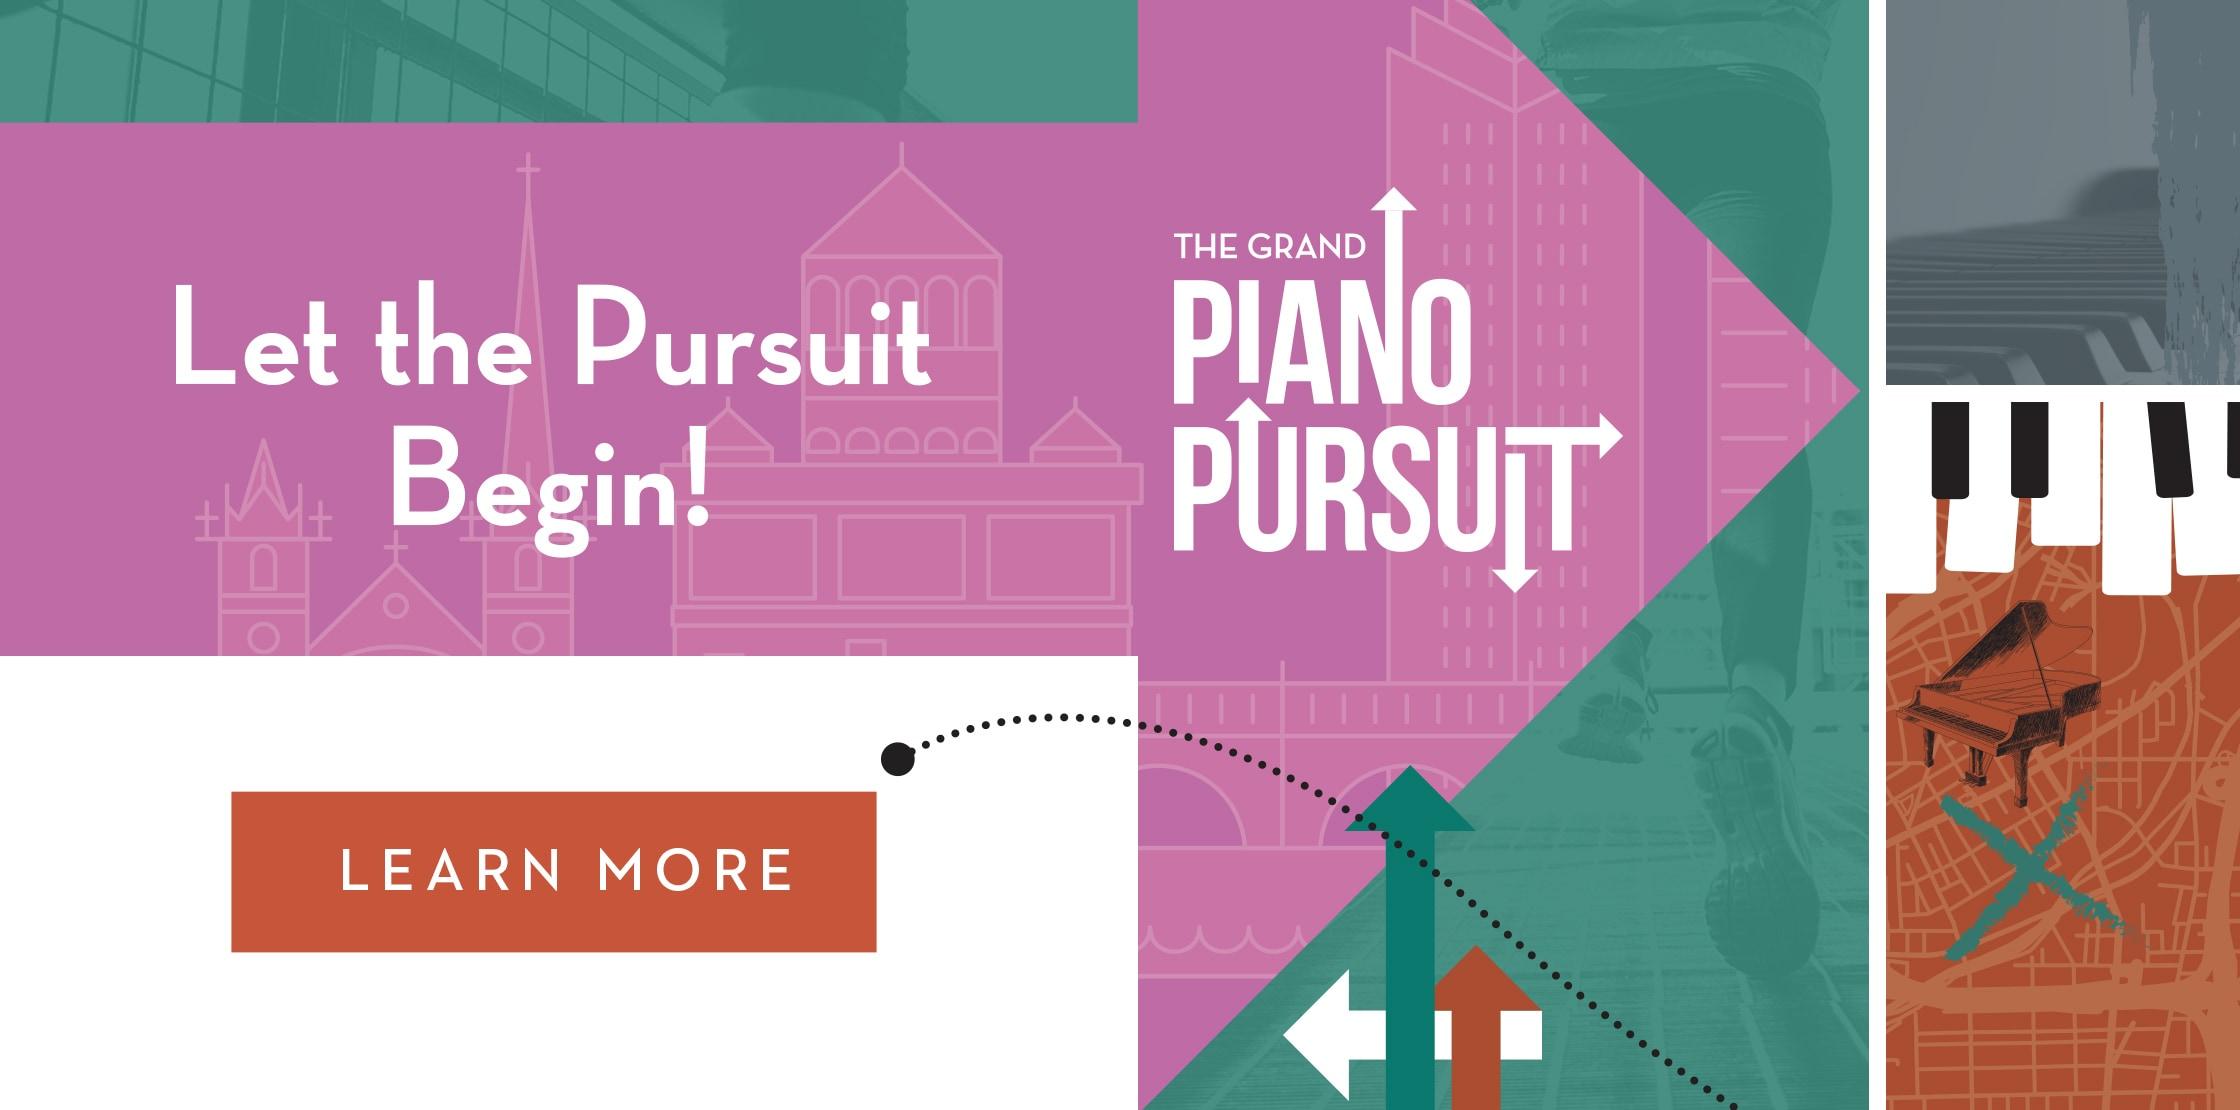 Piano Cleveland present The Grand Piano Pursuit